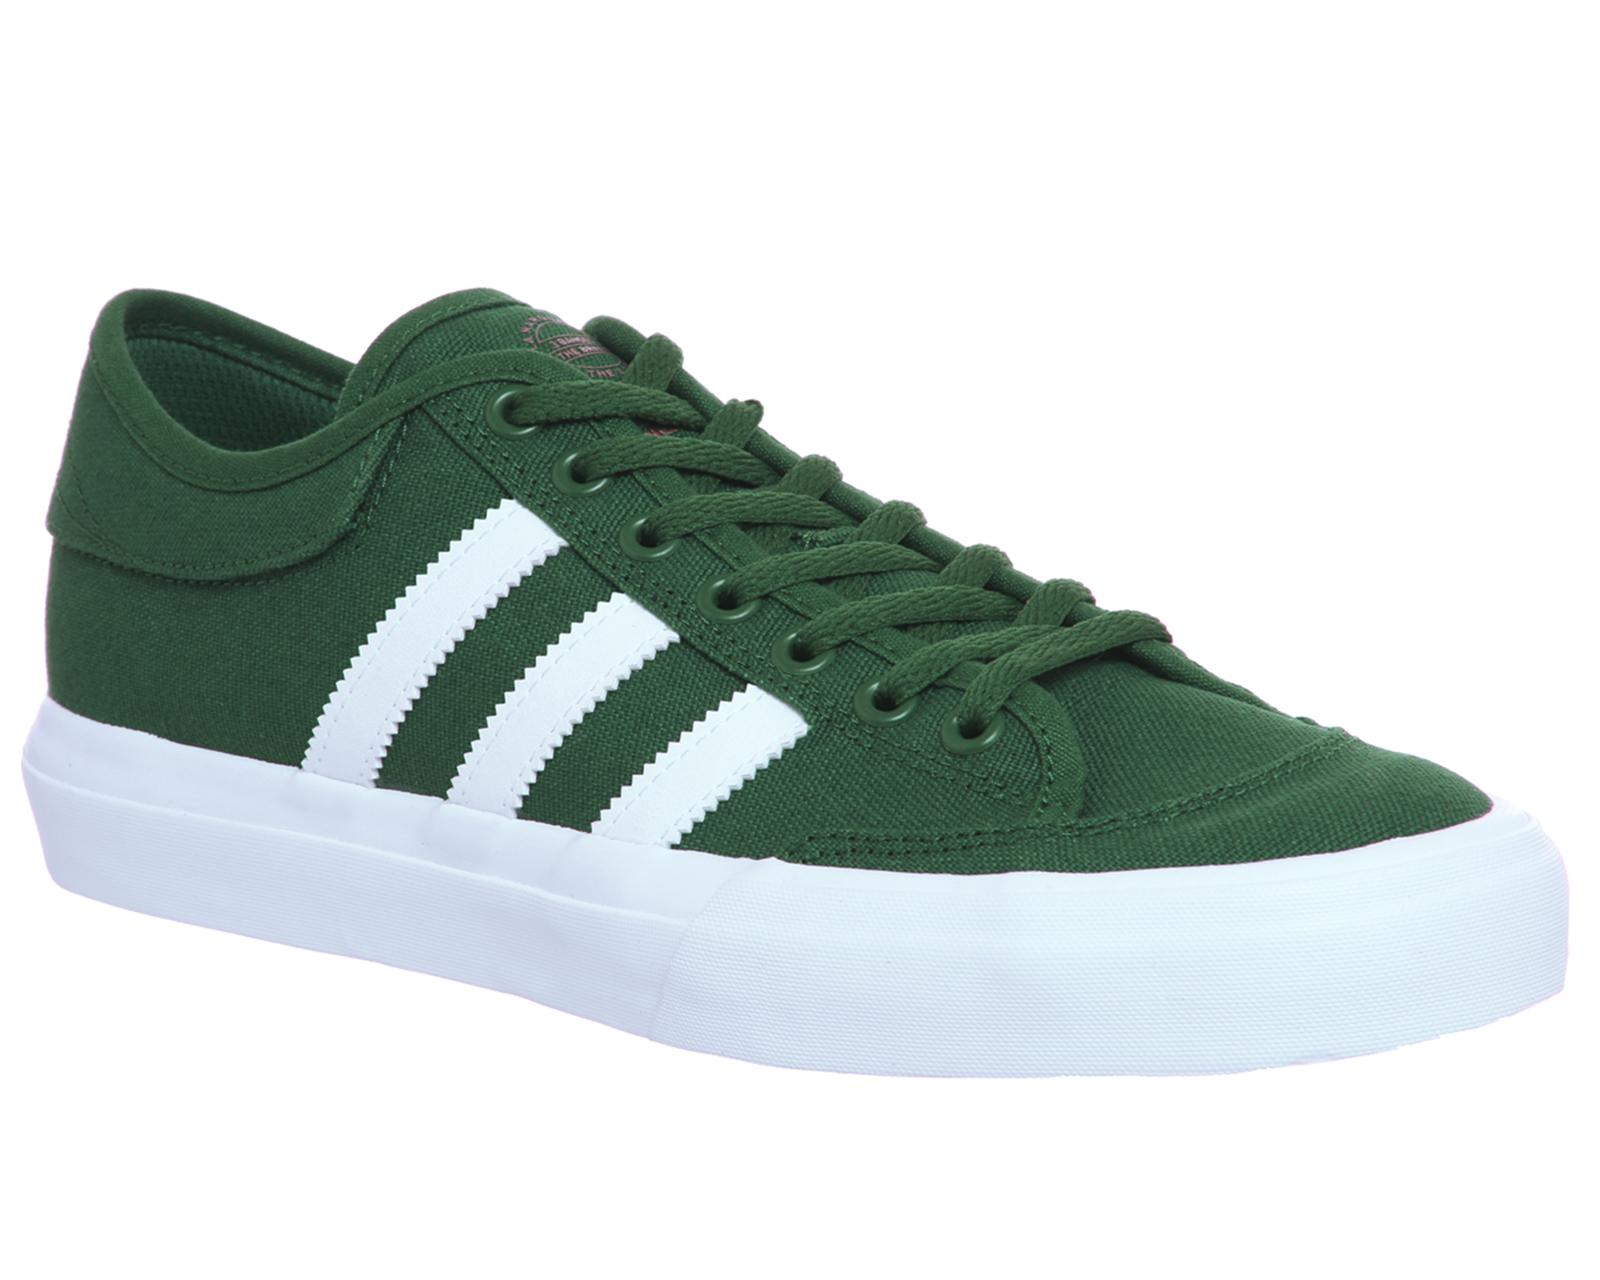 wholesale dealer 3d648 49eab SENTINEL Scarpe Adidas Matchcourt istruttori gomma bianca verde nobile  formatori